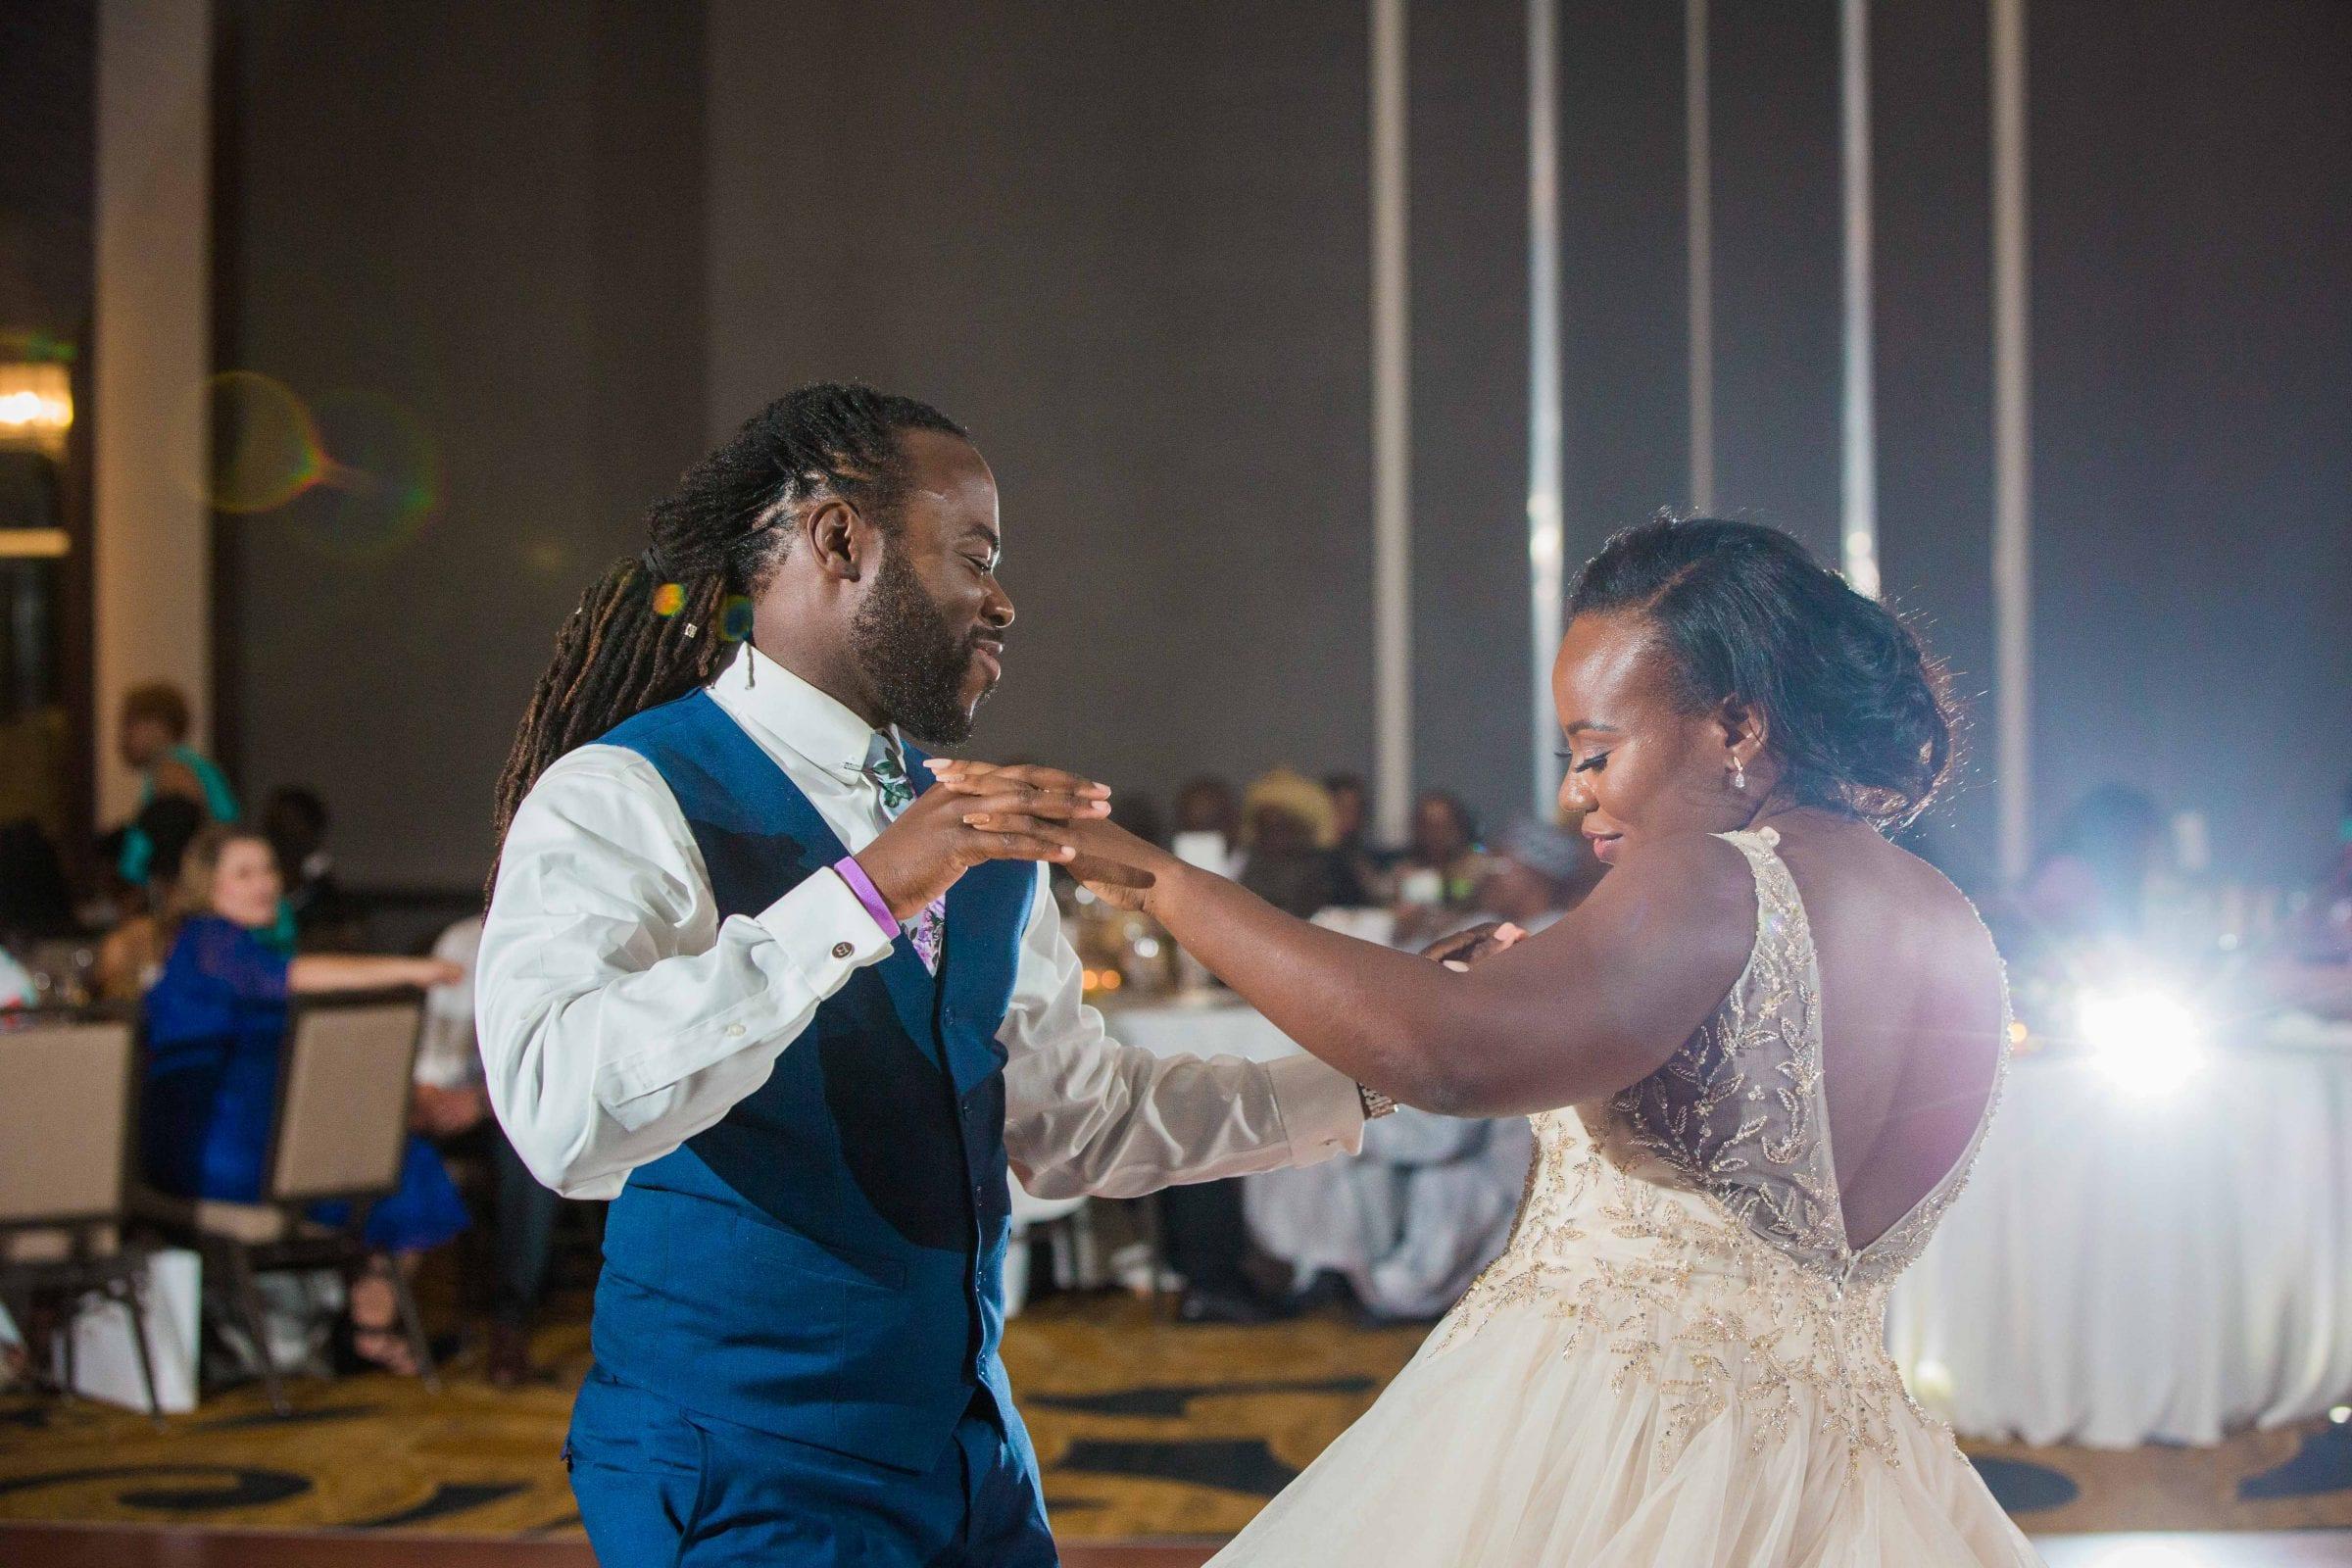 Onyema wedding La Cantera dancing boogie